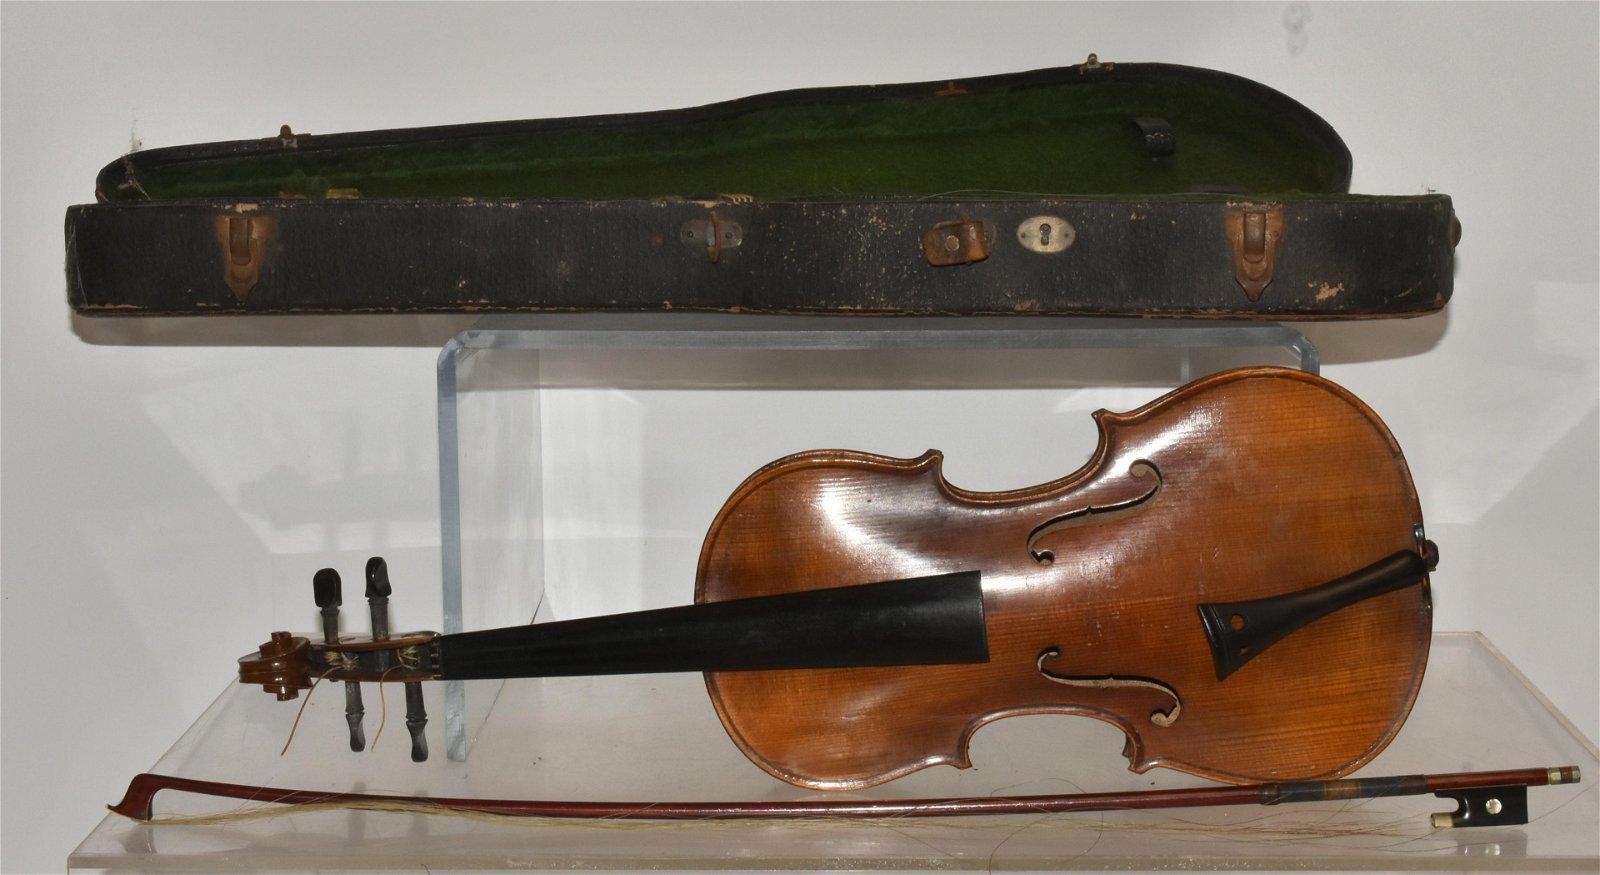 Vintage German Violin with Bow